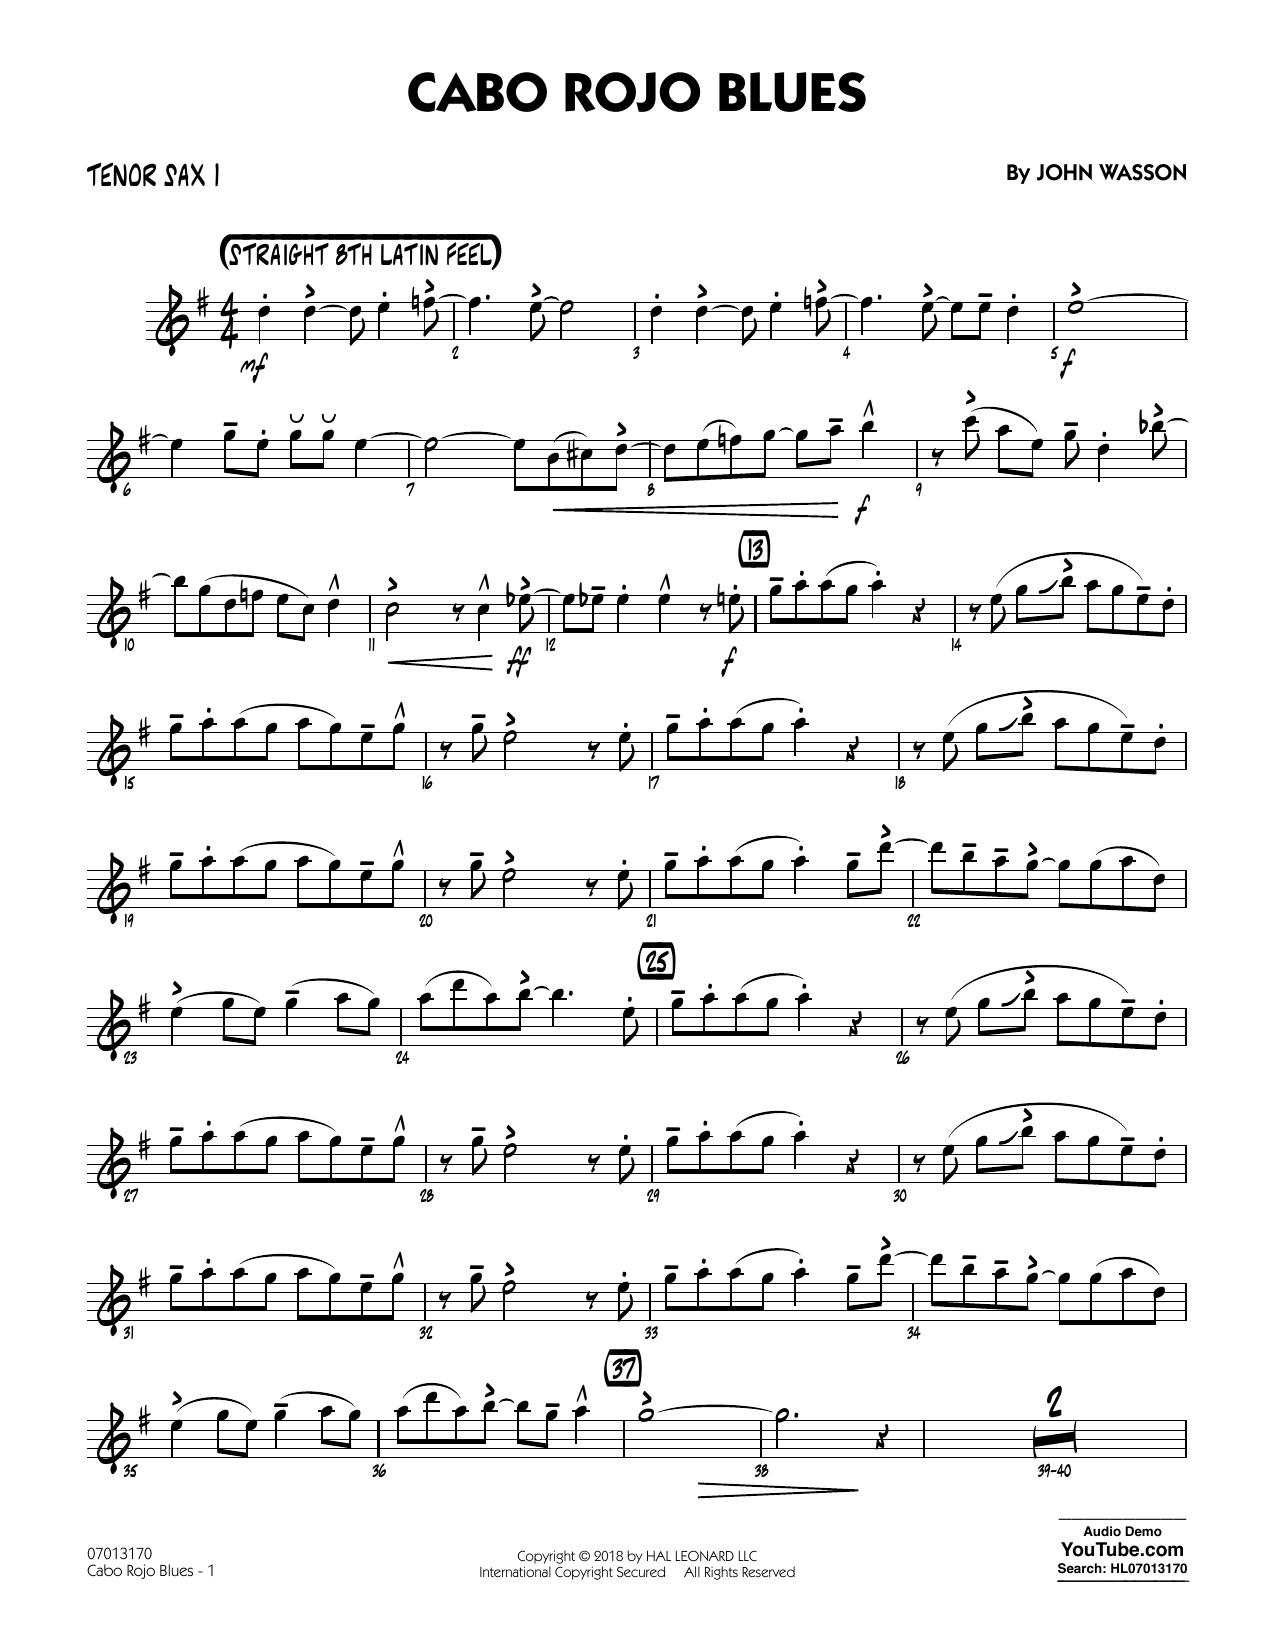 John Wasson Cabo Rojo Blues - Tenor Sax 1 sheet music notes and chords. Download Printable PDF.